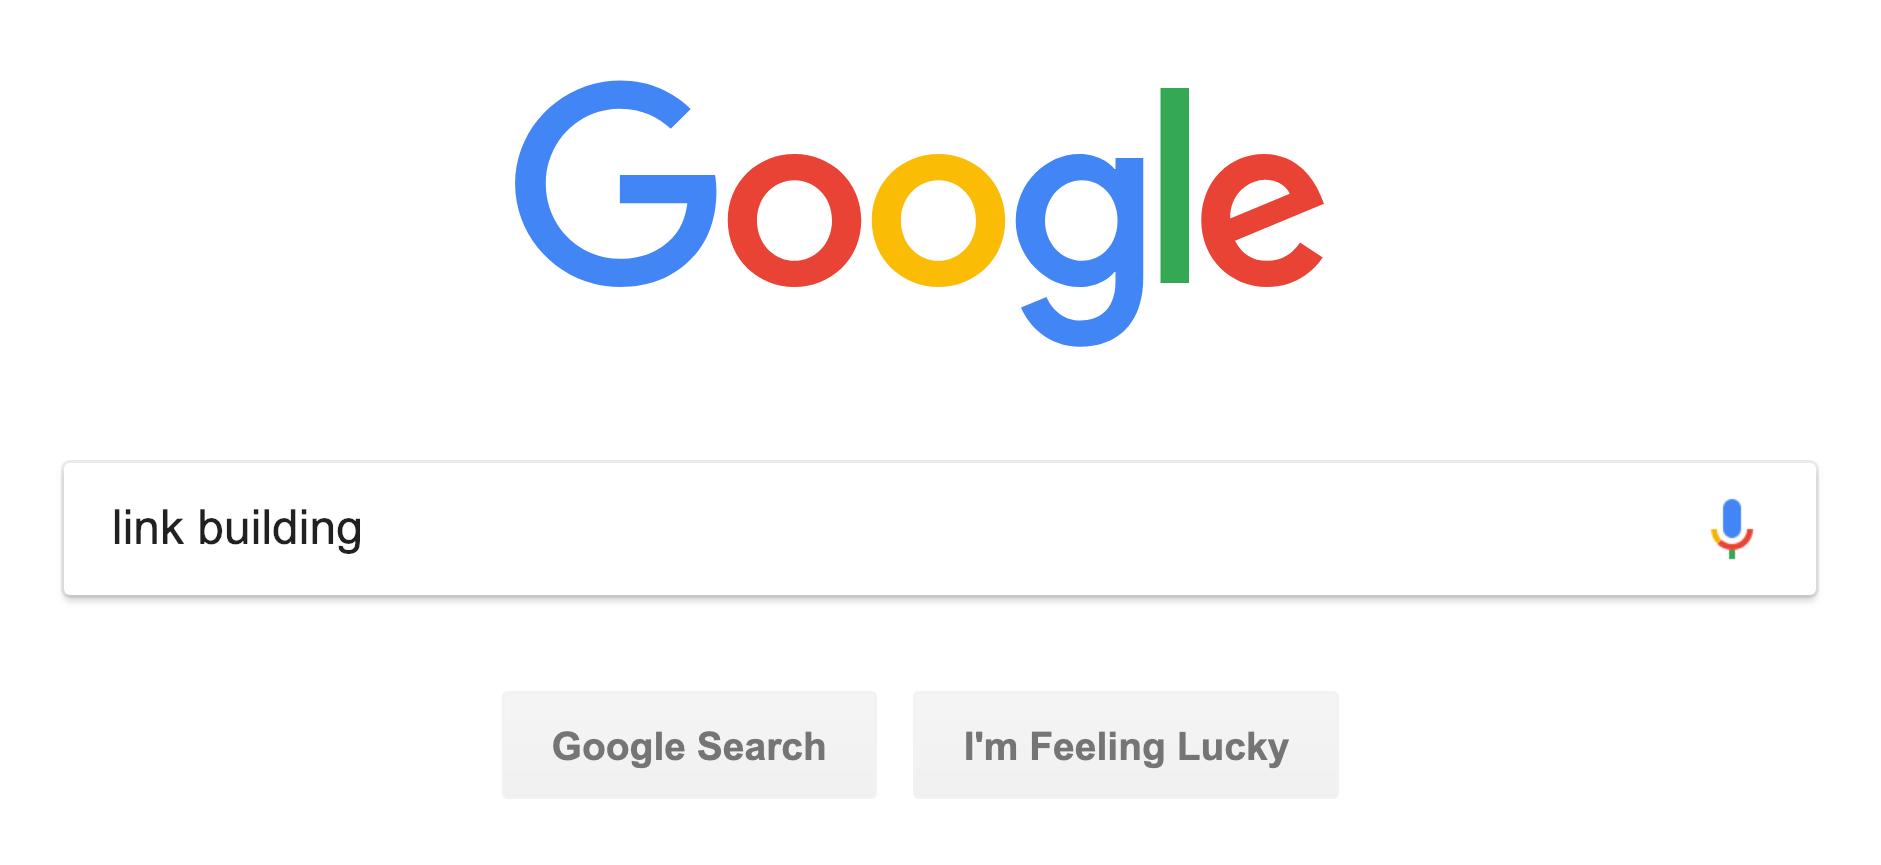 Google Suggest – Enter keyword